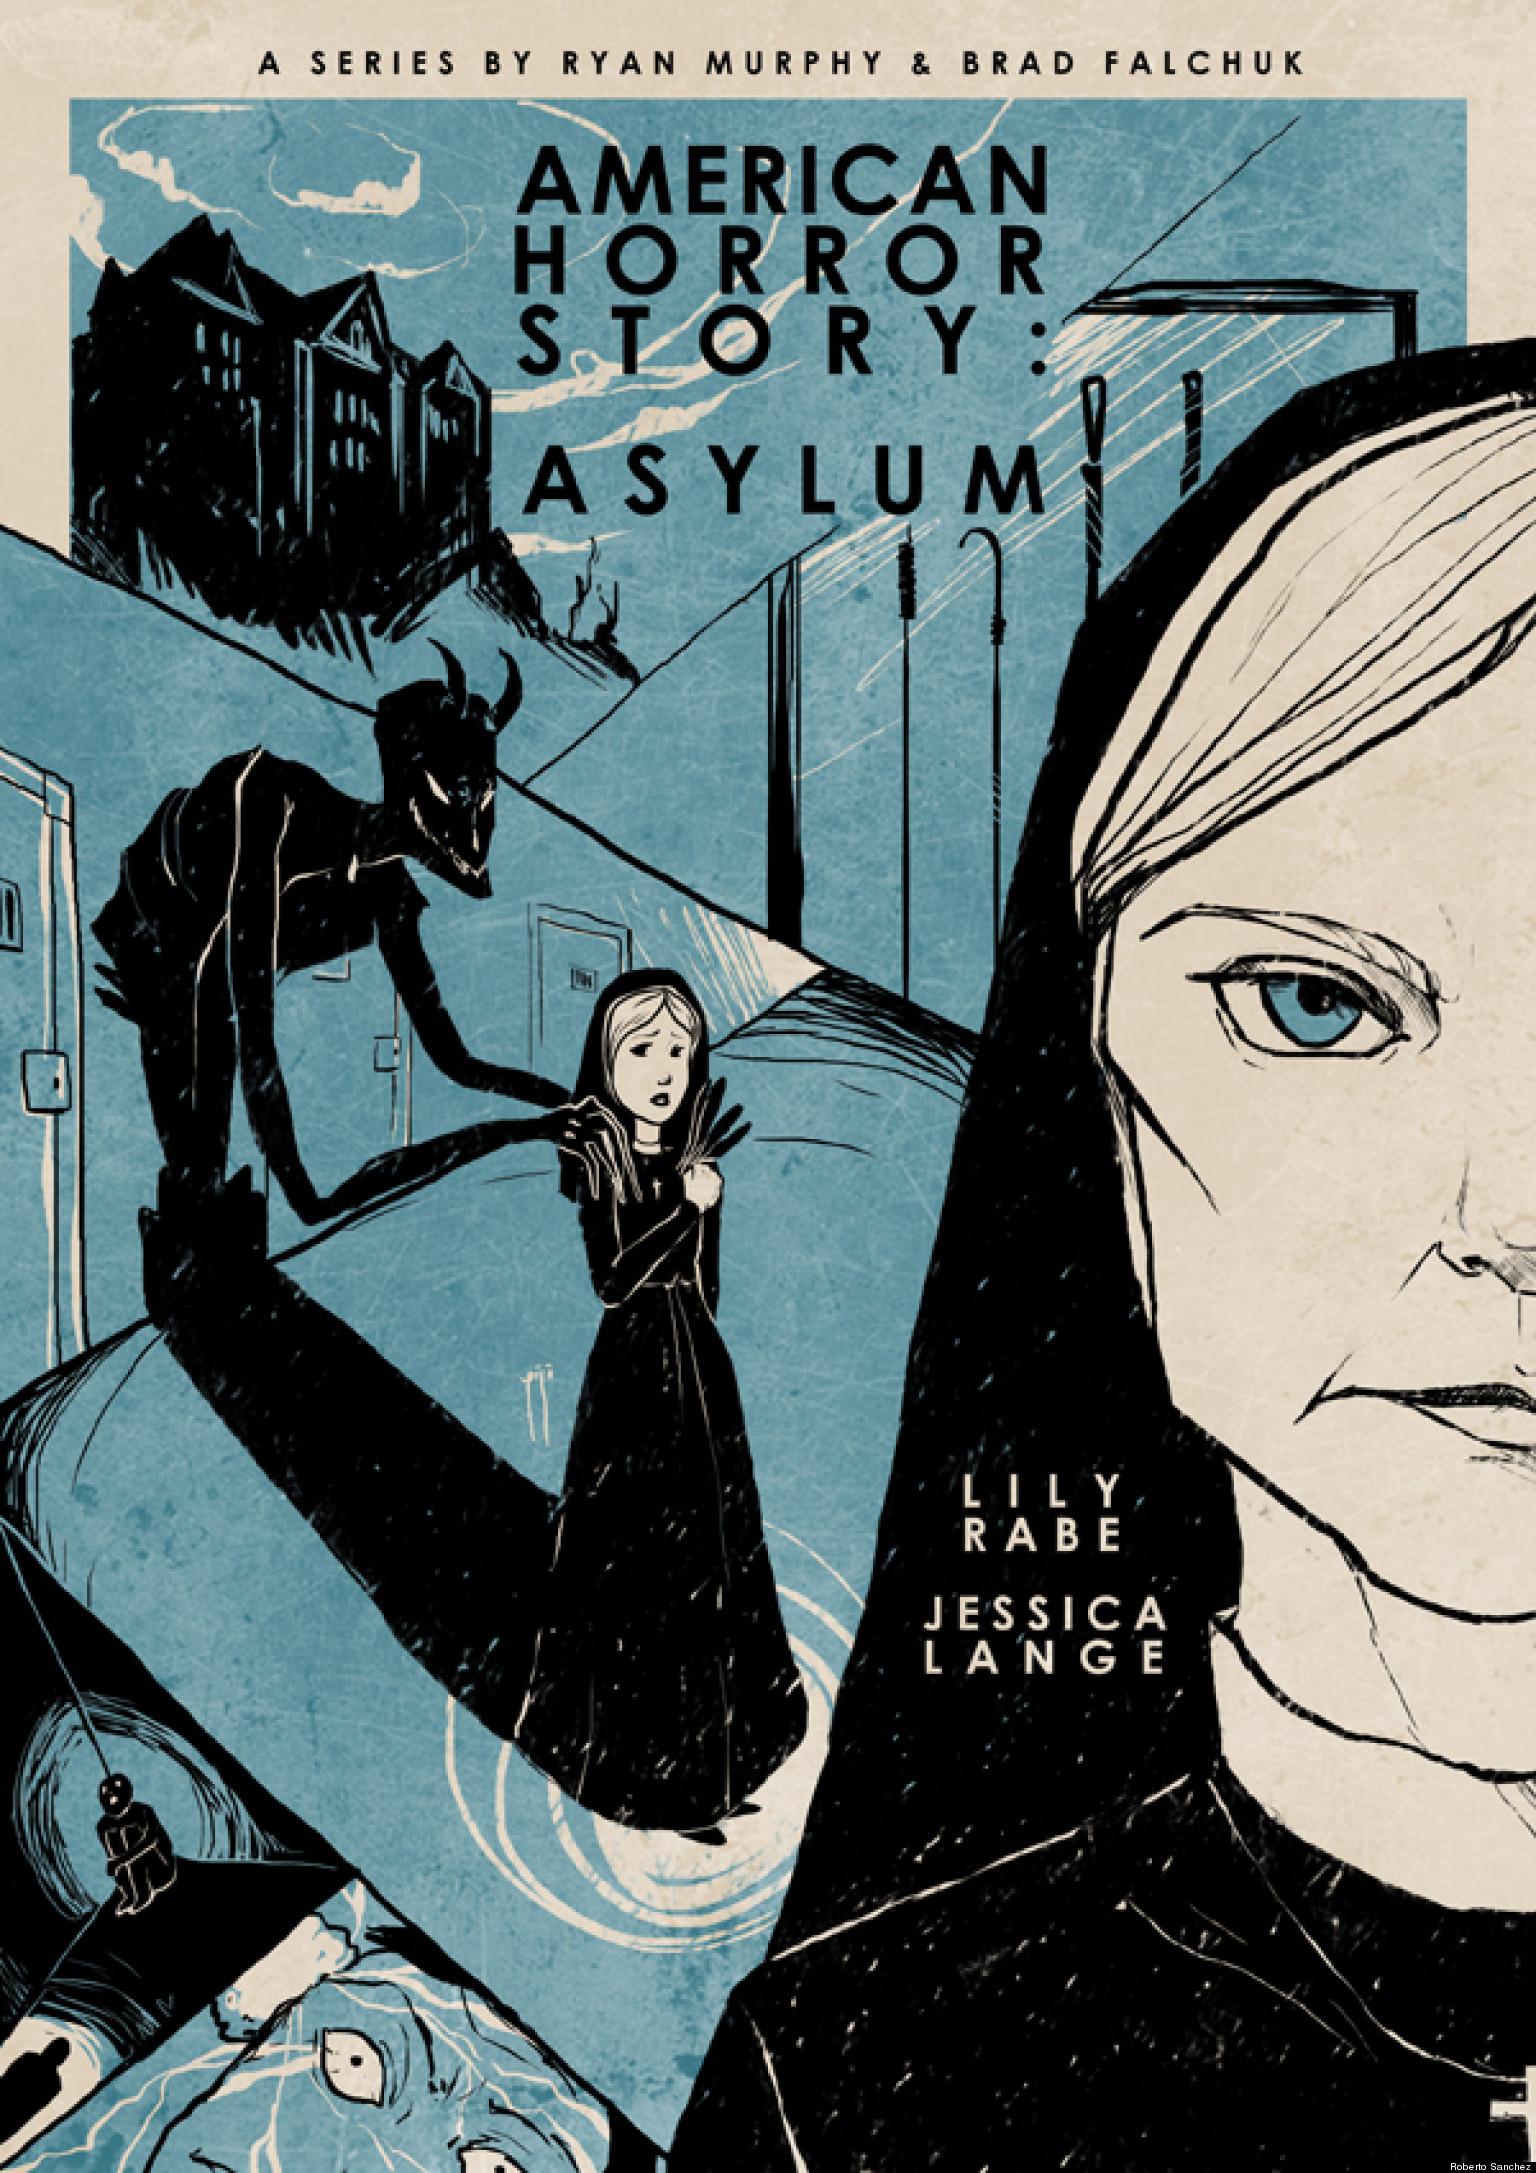 o-american-horror-story-asylum-vintage-posters-facebook